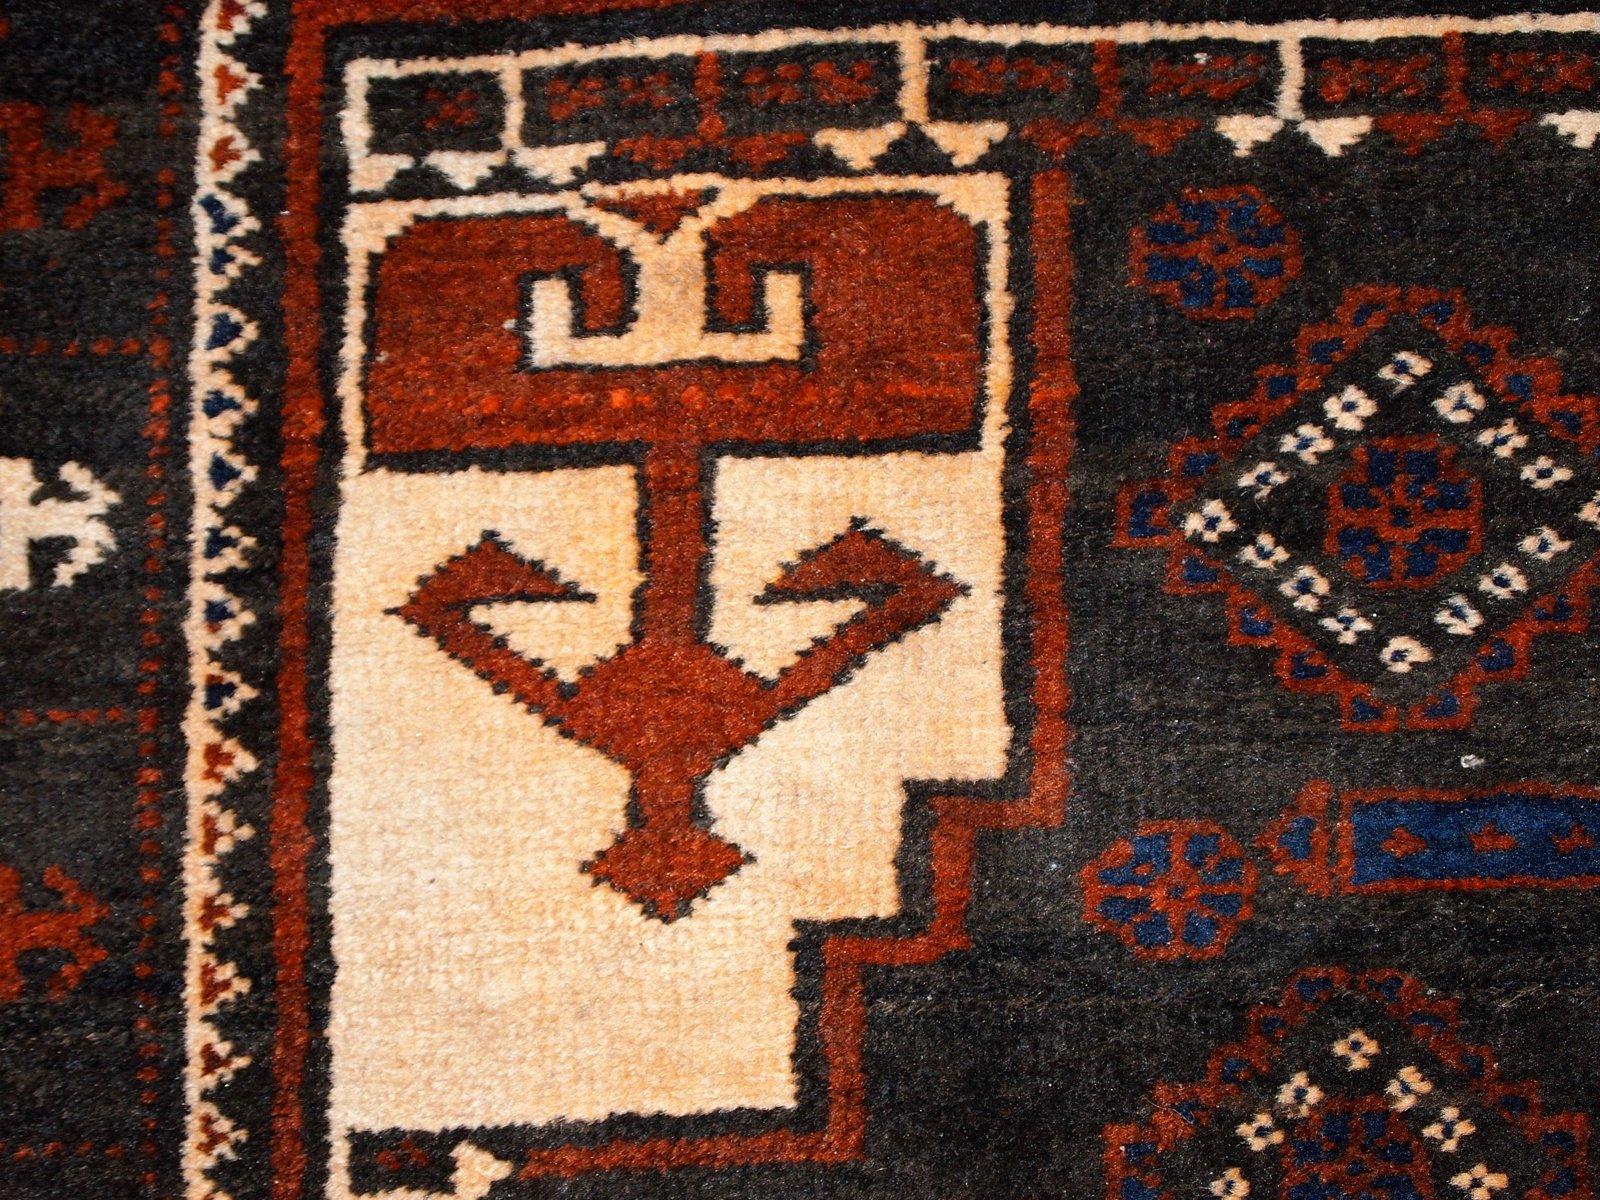 Vintage Handmade Afghan Baluch Rug 1940s For Sale At Pamono